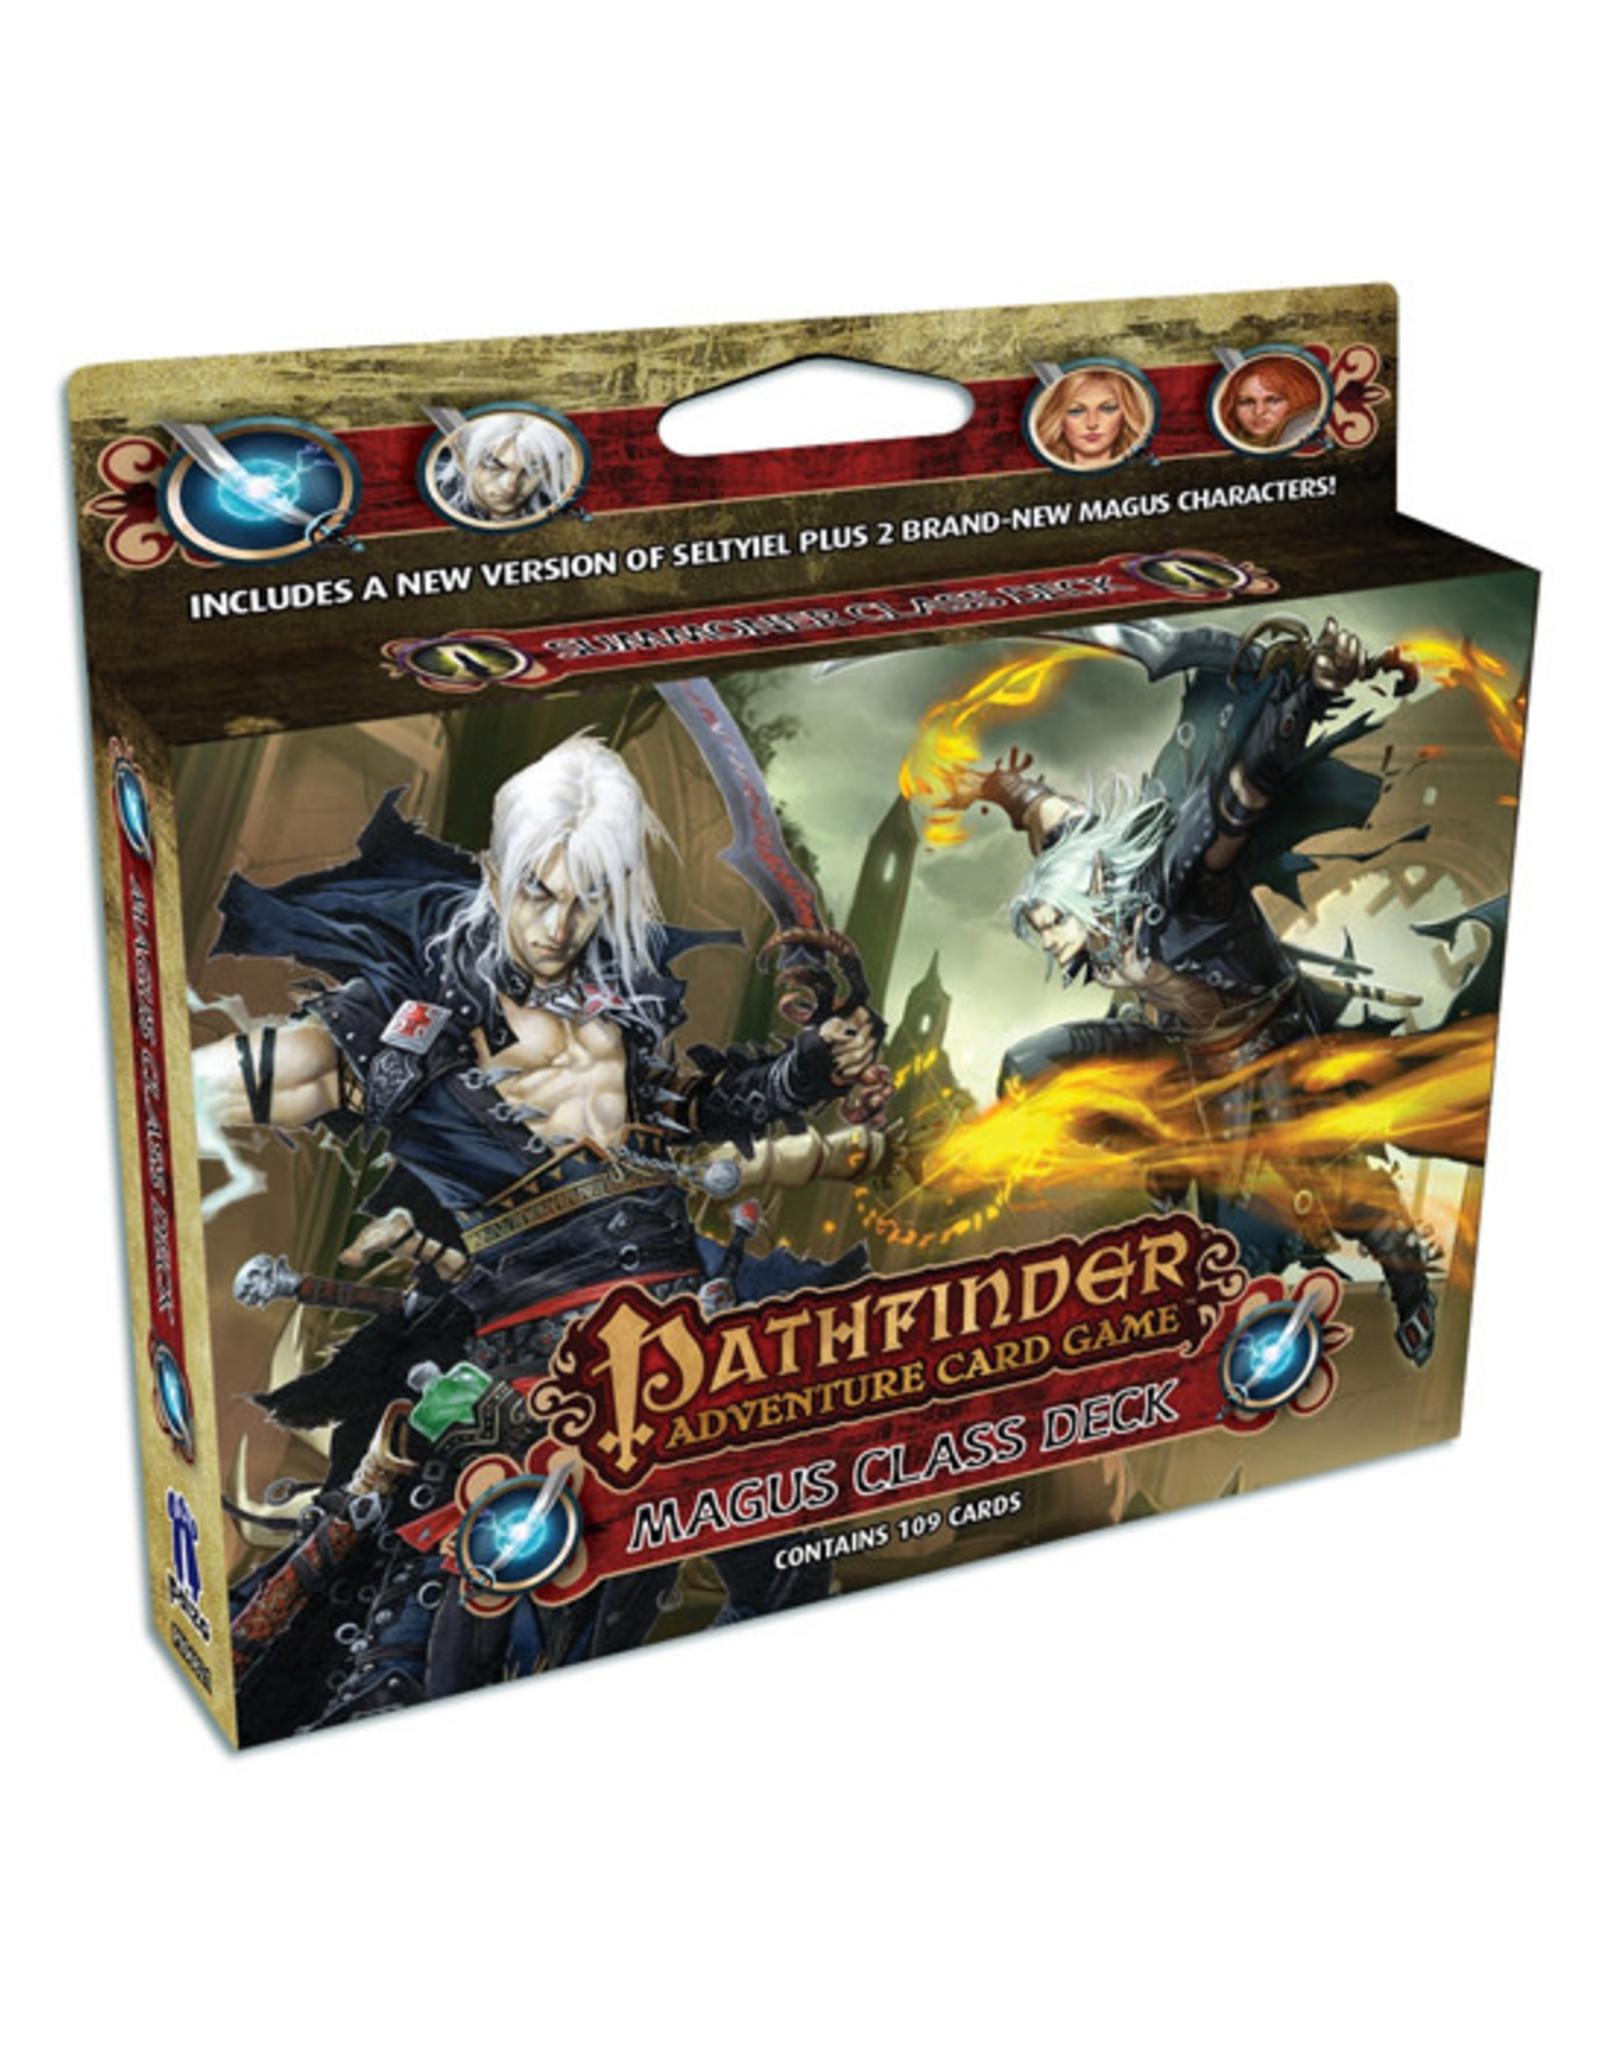 Pathfinder Pathfinder: Adventure Card Game - Magus Class Deck